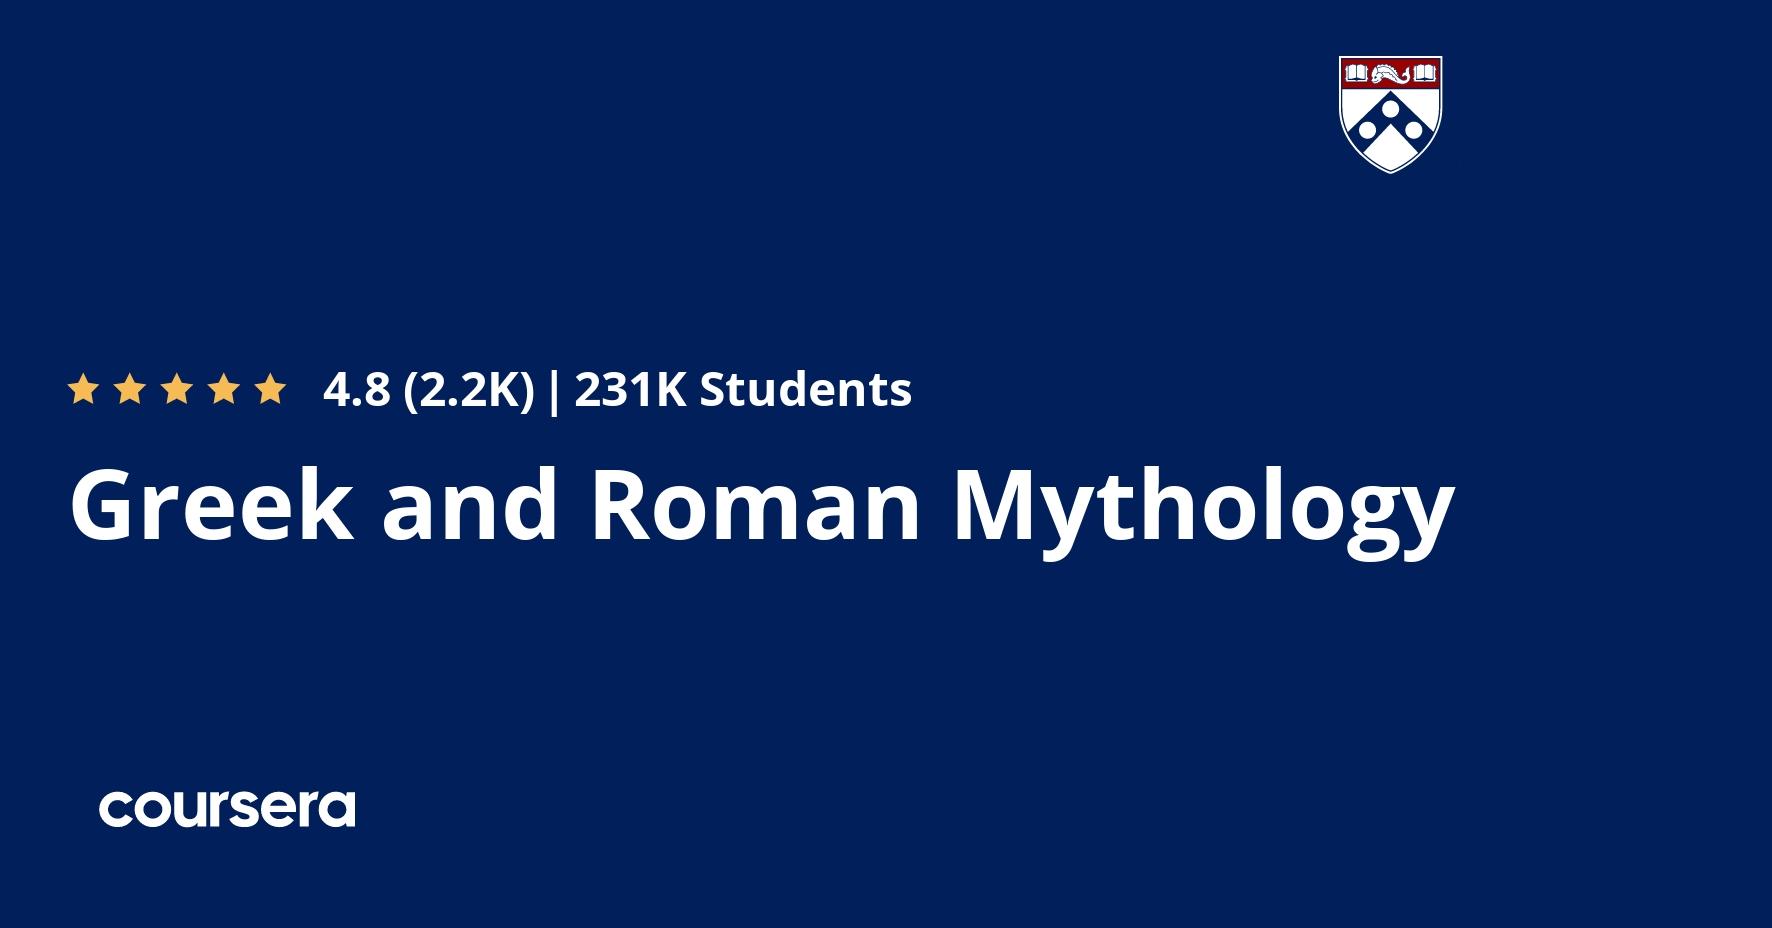 hight resolution of Greek and Roman Mythology   Coursera